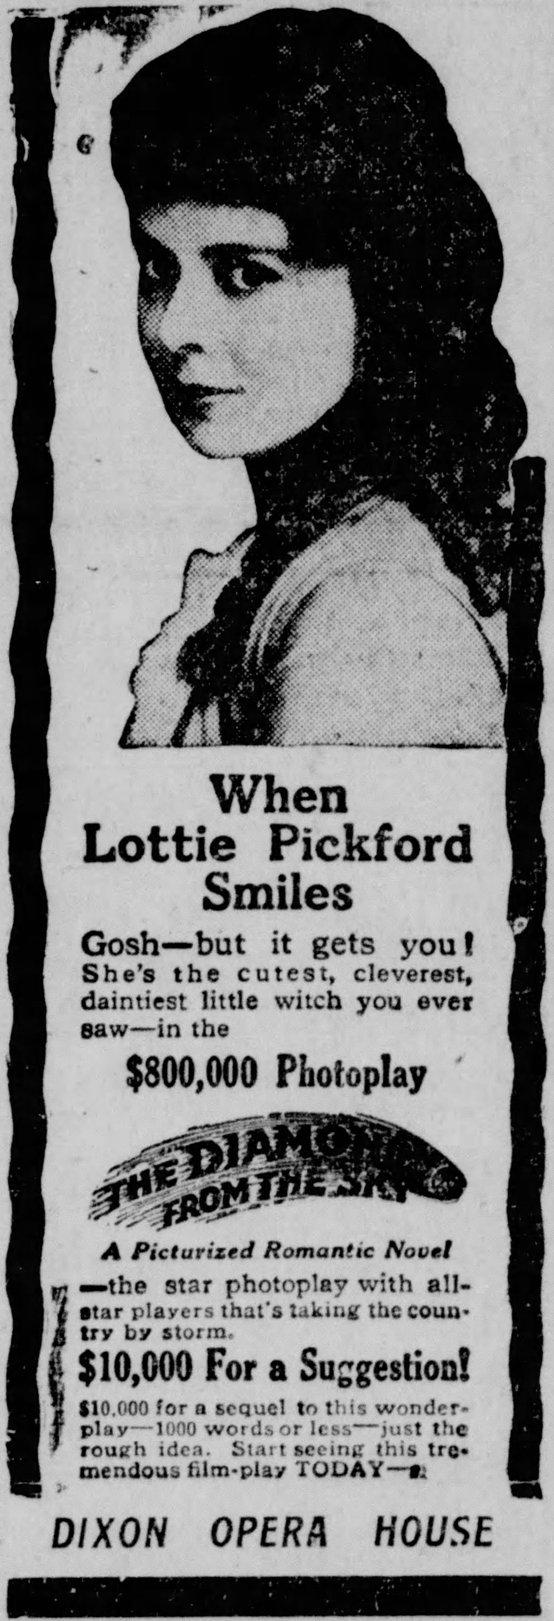 Source: Dixon Evening Telegraph of Dixon, IL, May 27, 1915, page 5.